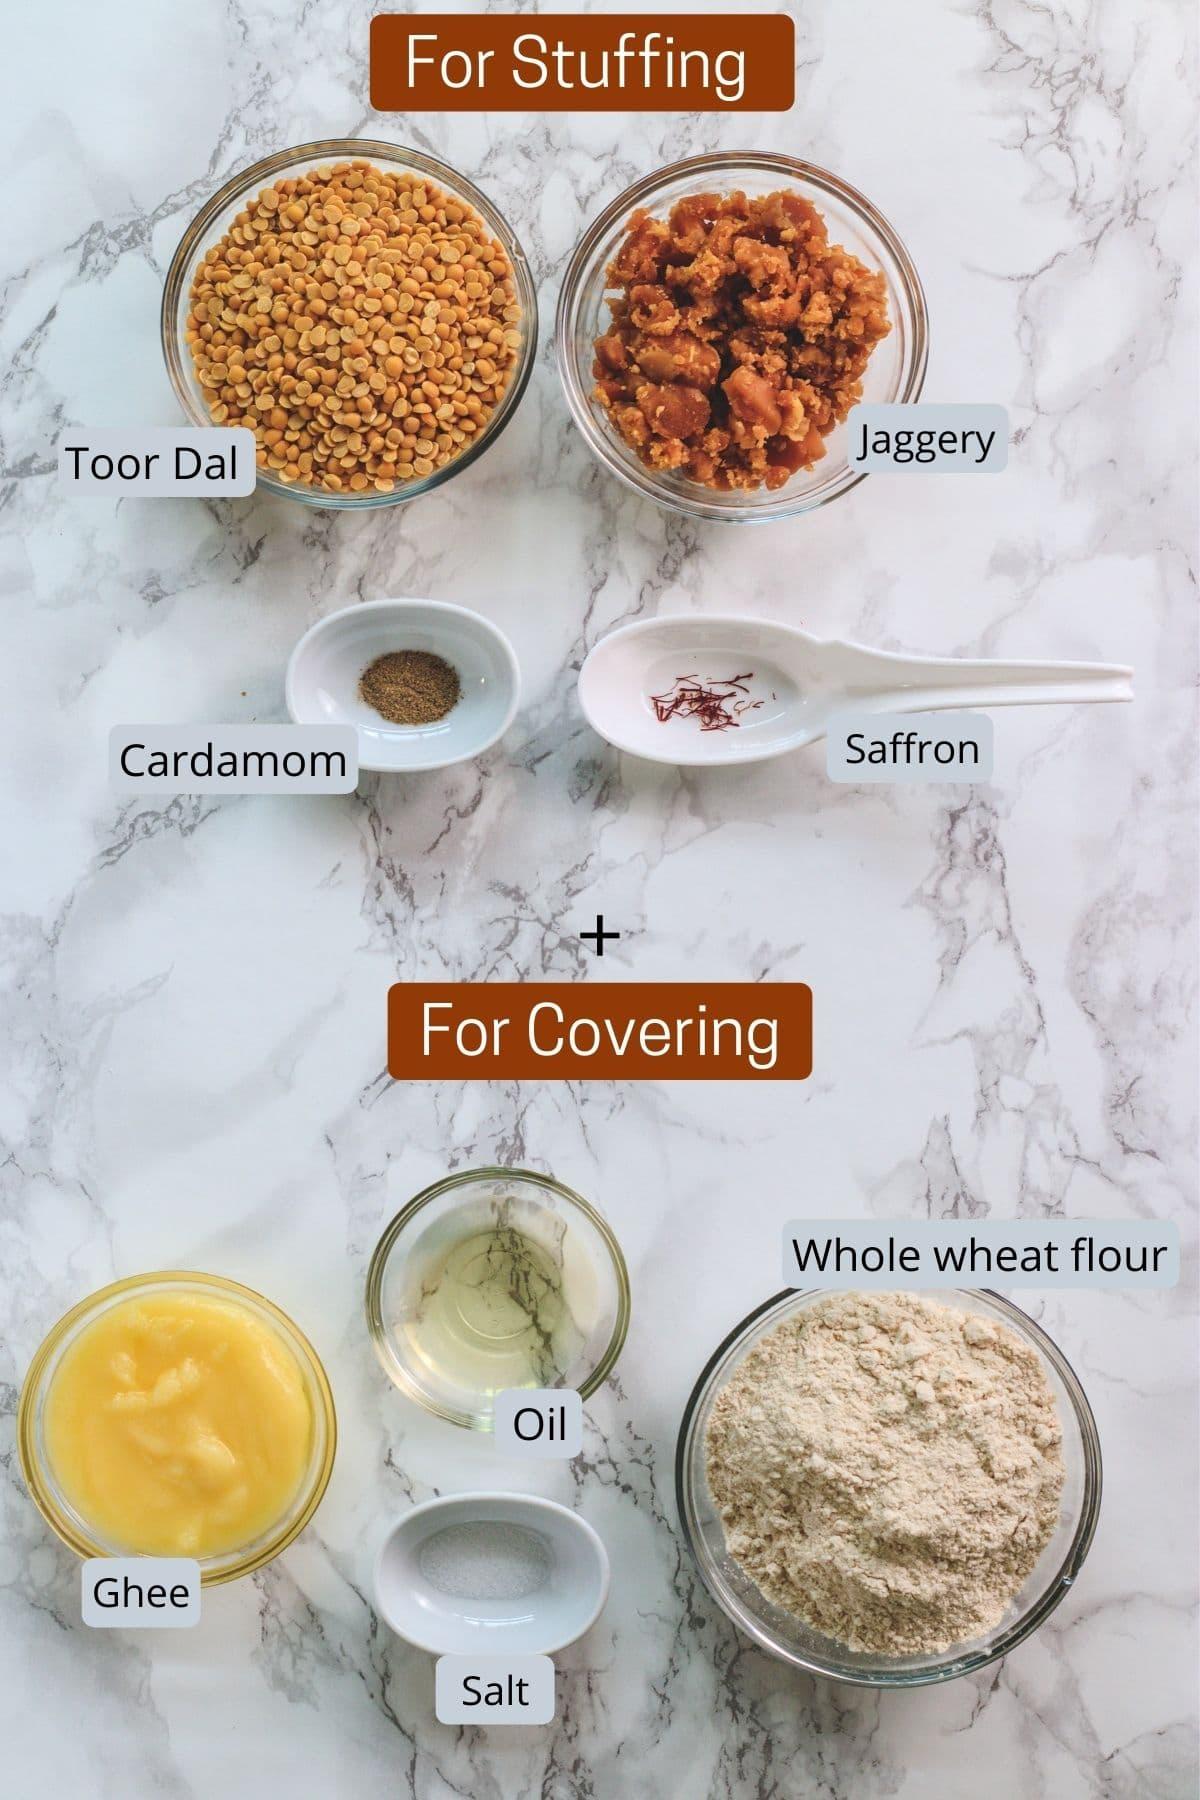 image of ingredients for puran poli. includes lentils, jaggery, saffron, cardamom, flour, salt, oil, ghee.